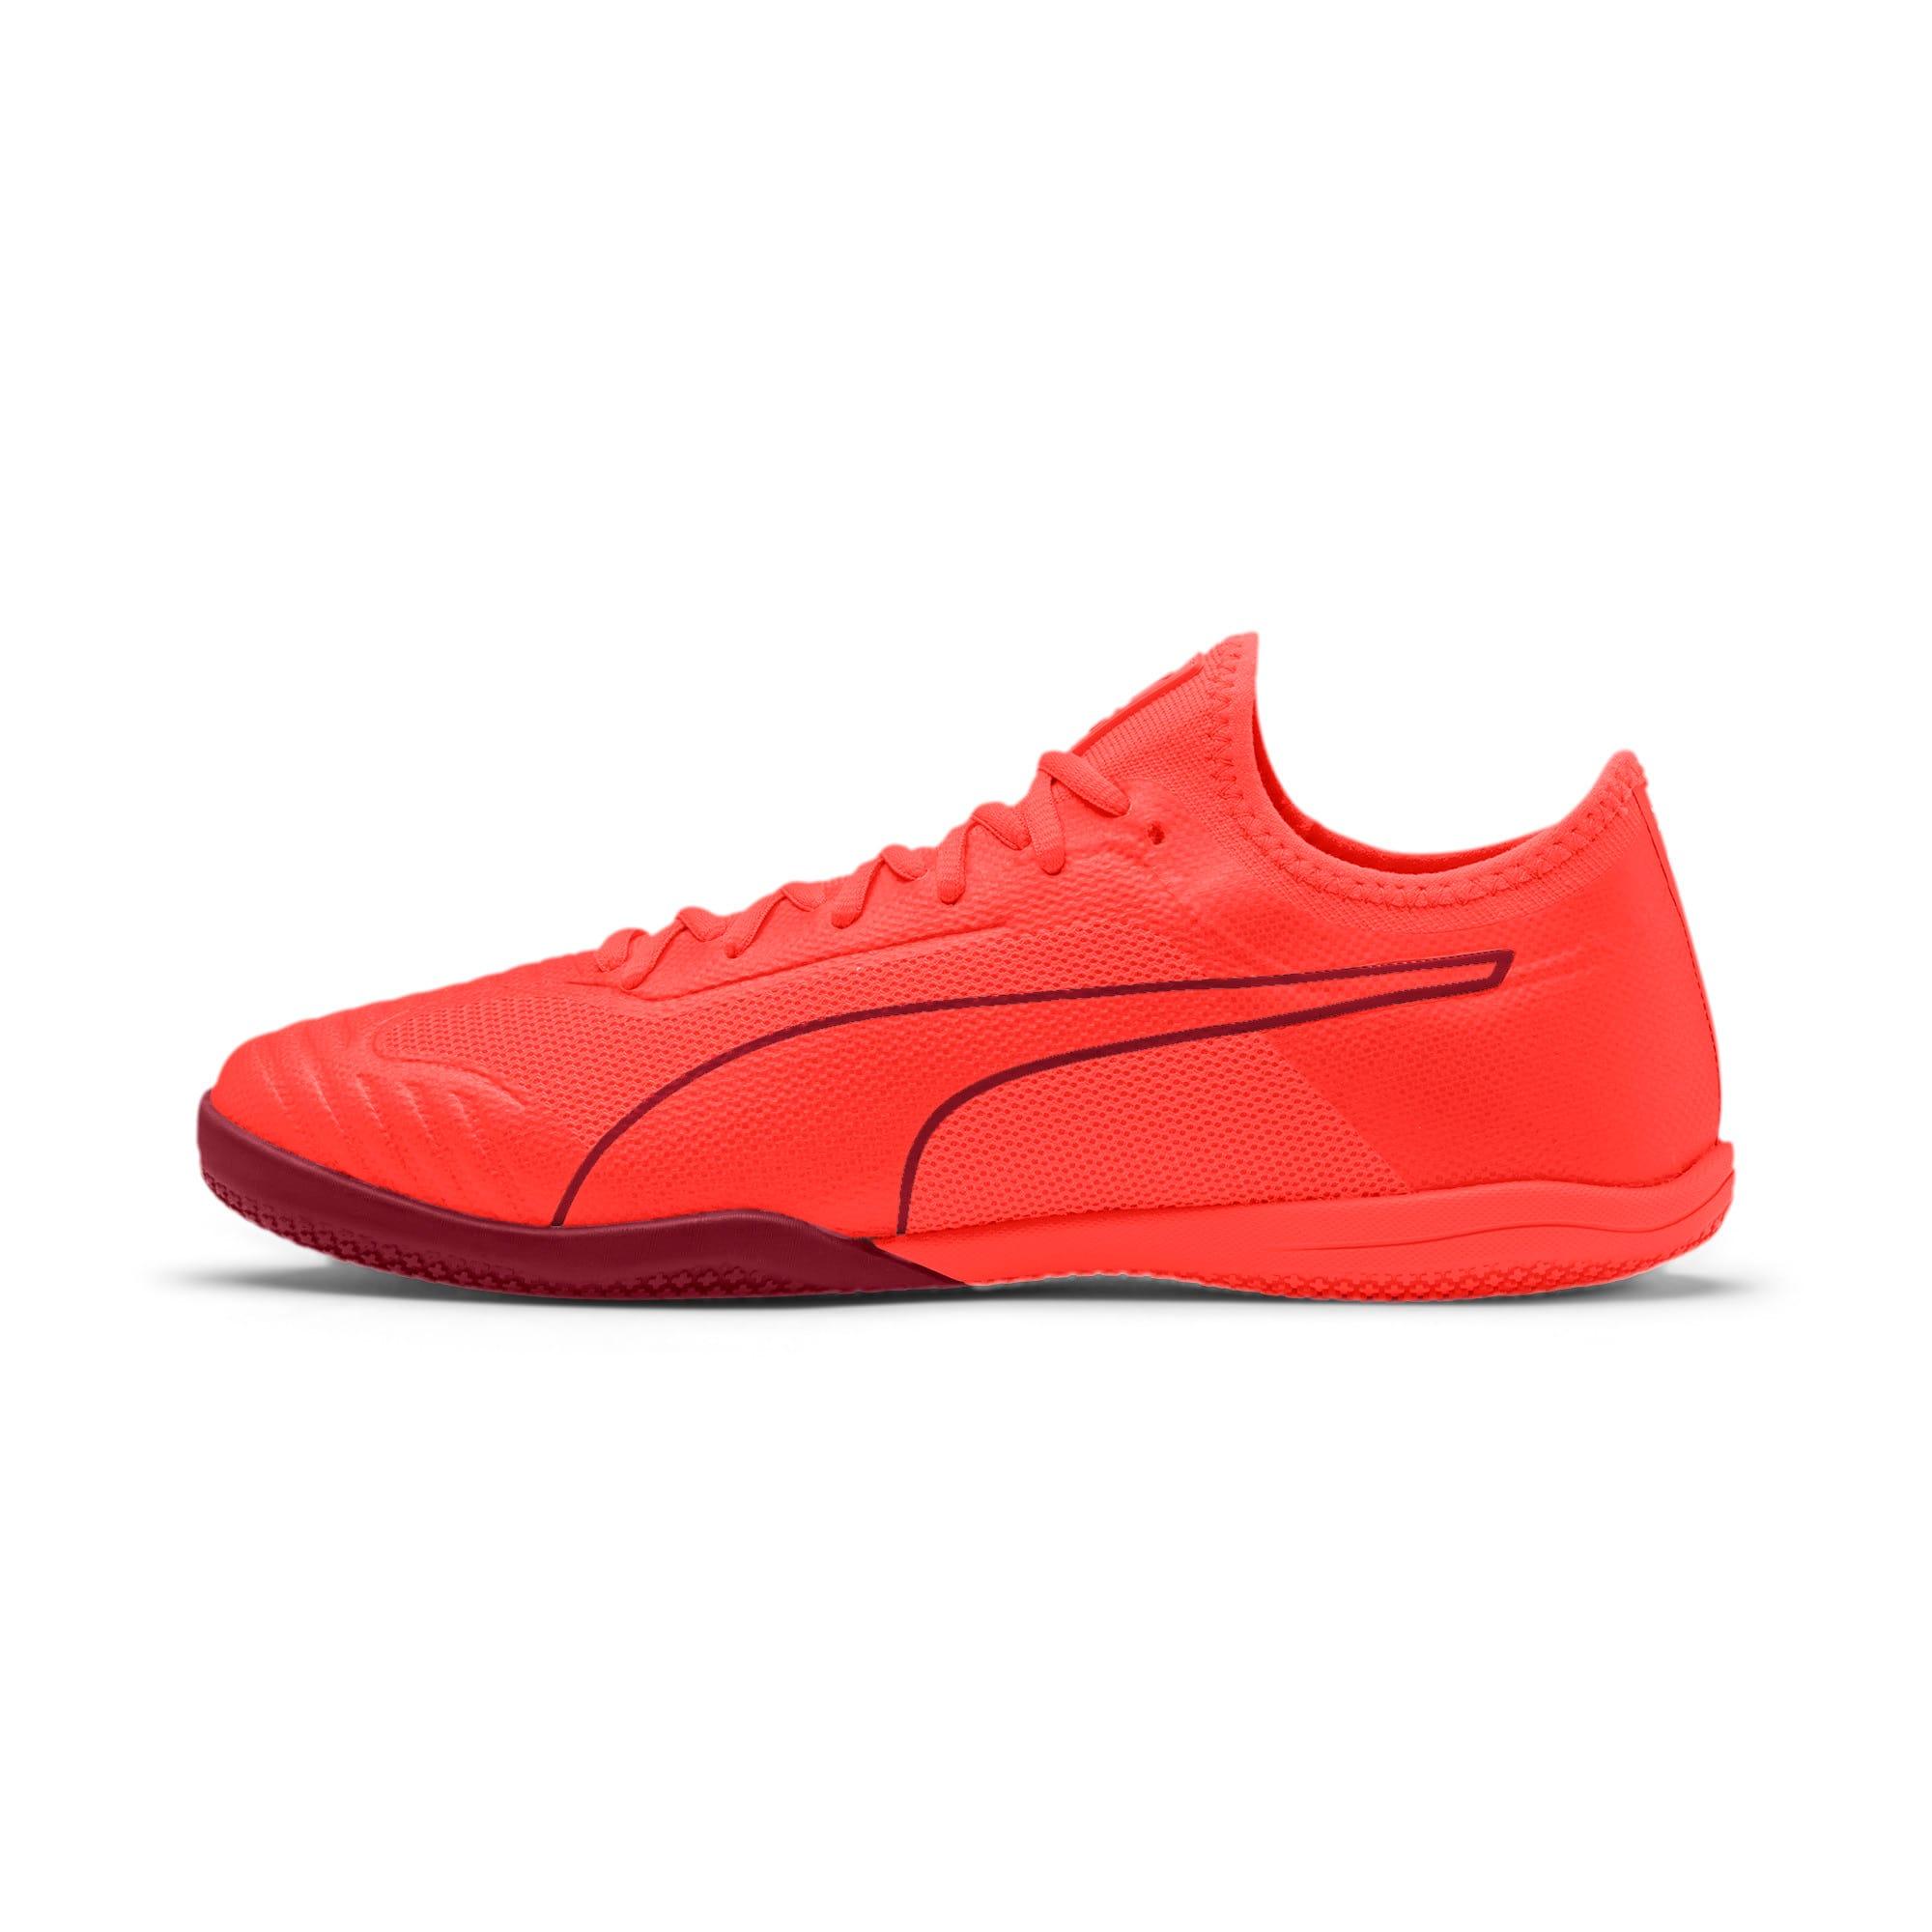 Thumbnail 1 of 365 Sala 1 Men's Soccer Shoes, Nrgy Red-Rhubarb, medium